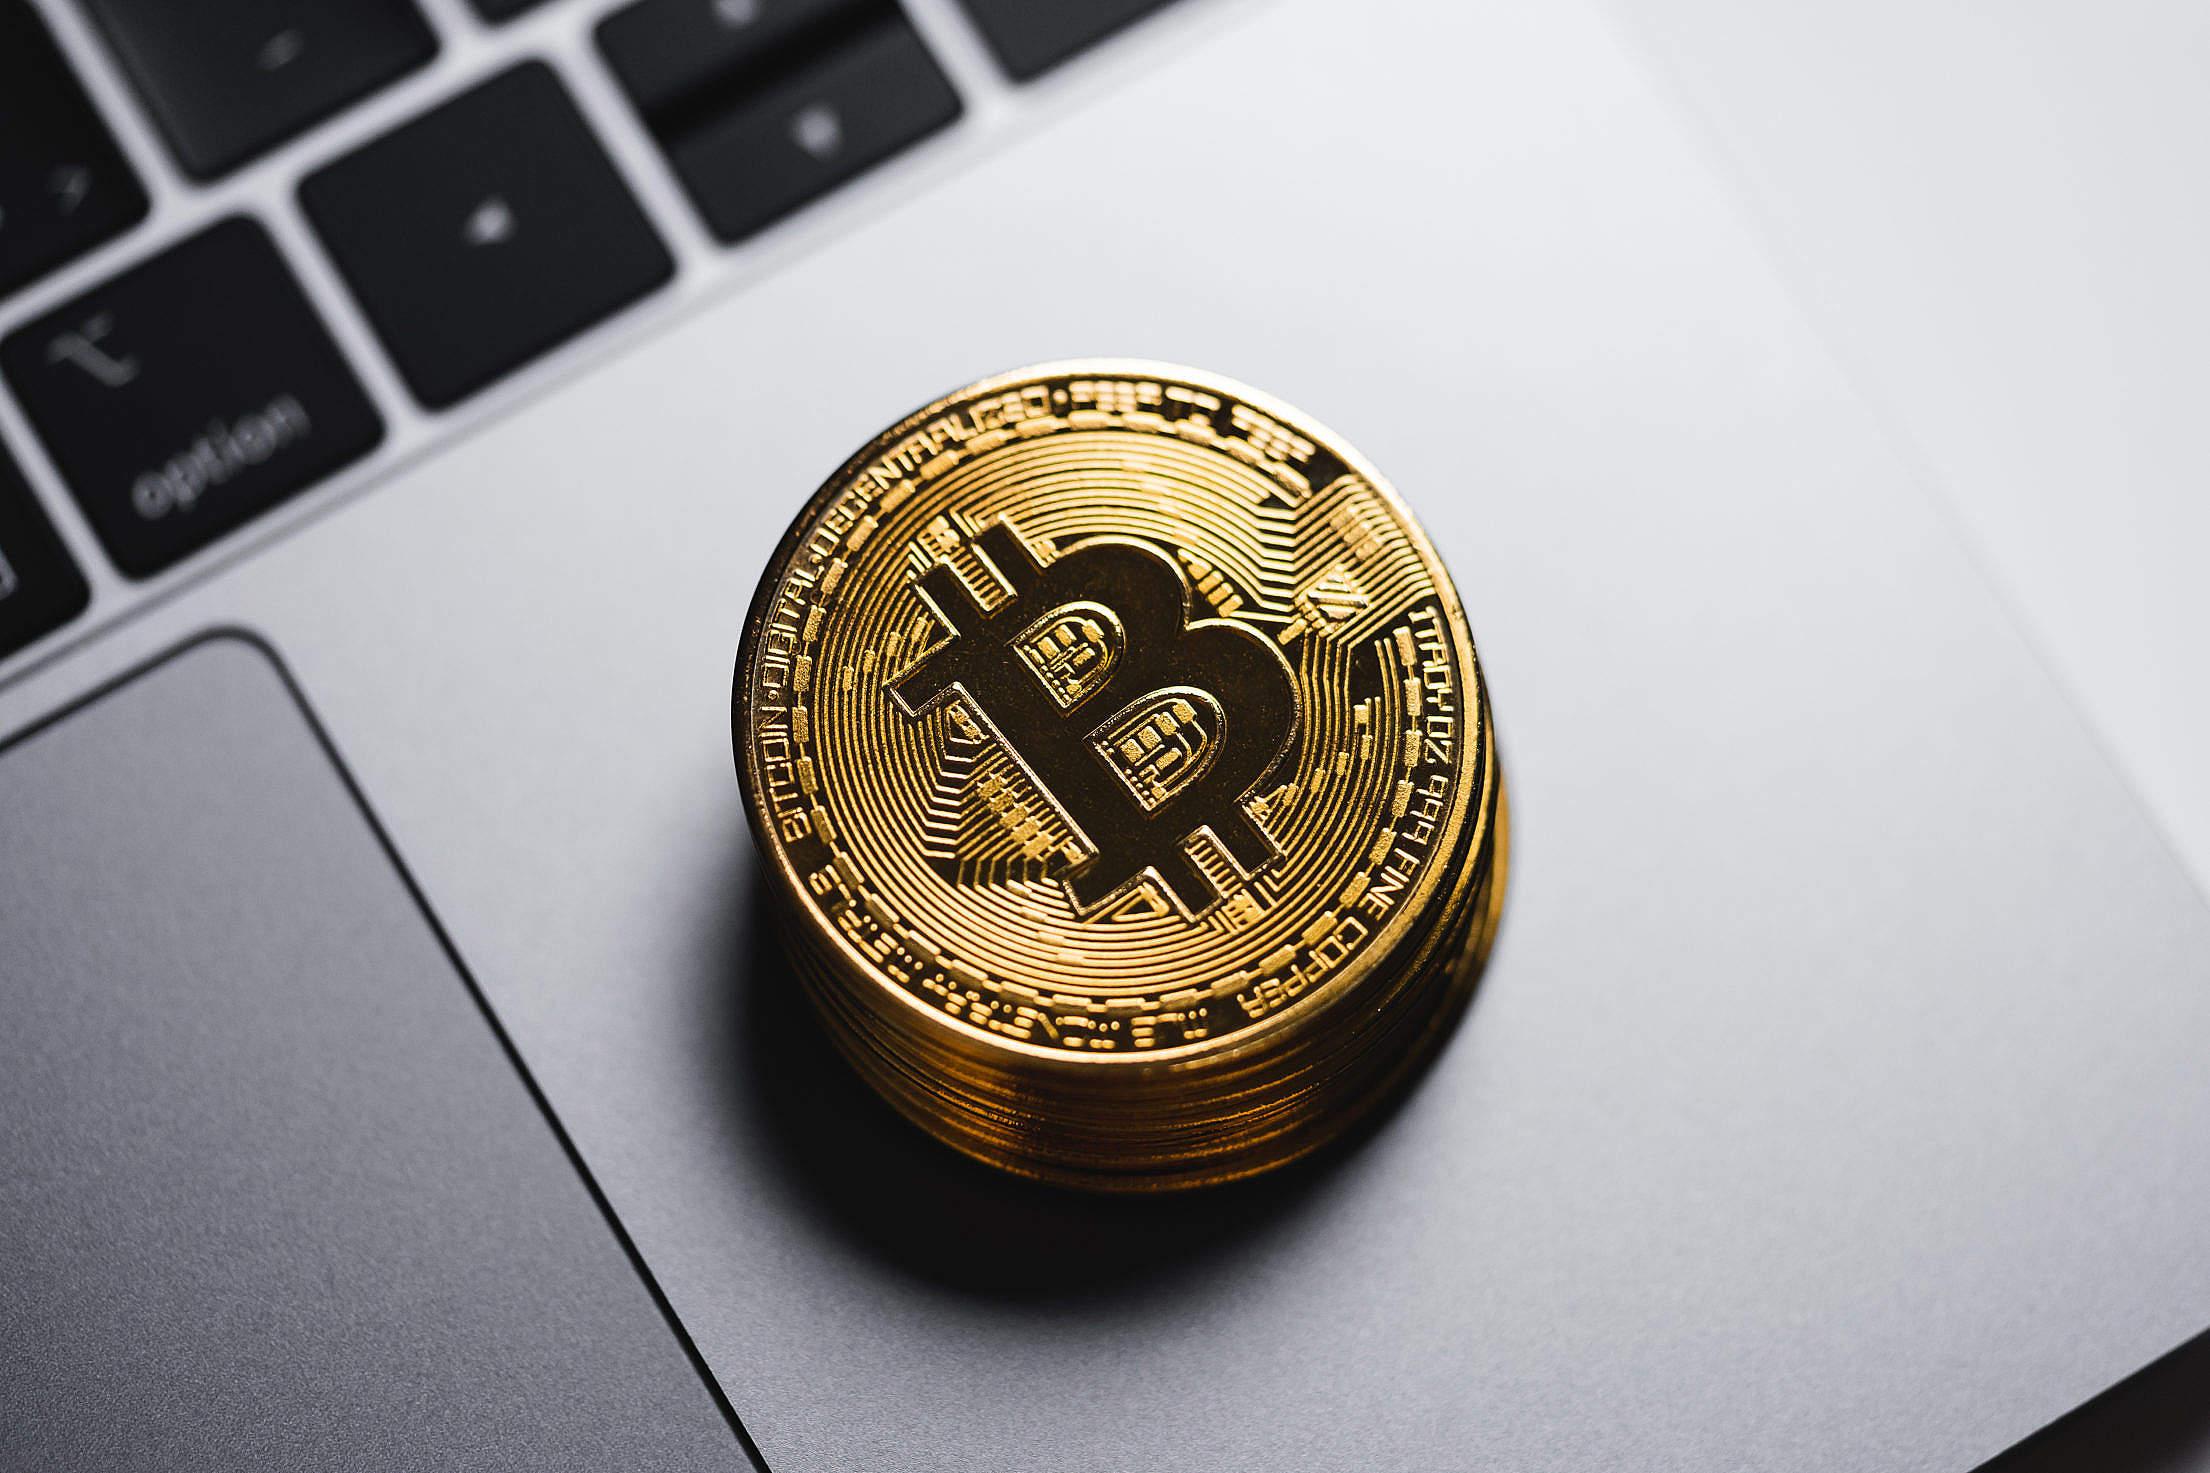 Gold Bitcoin on The MacBook Keyboard Free Stock Photo